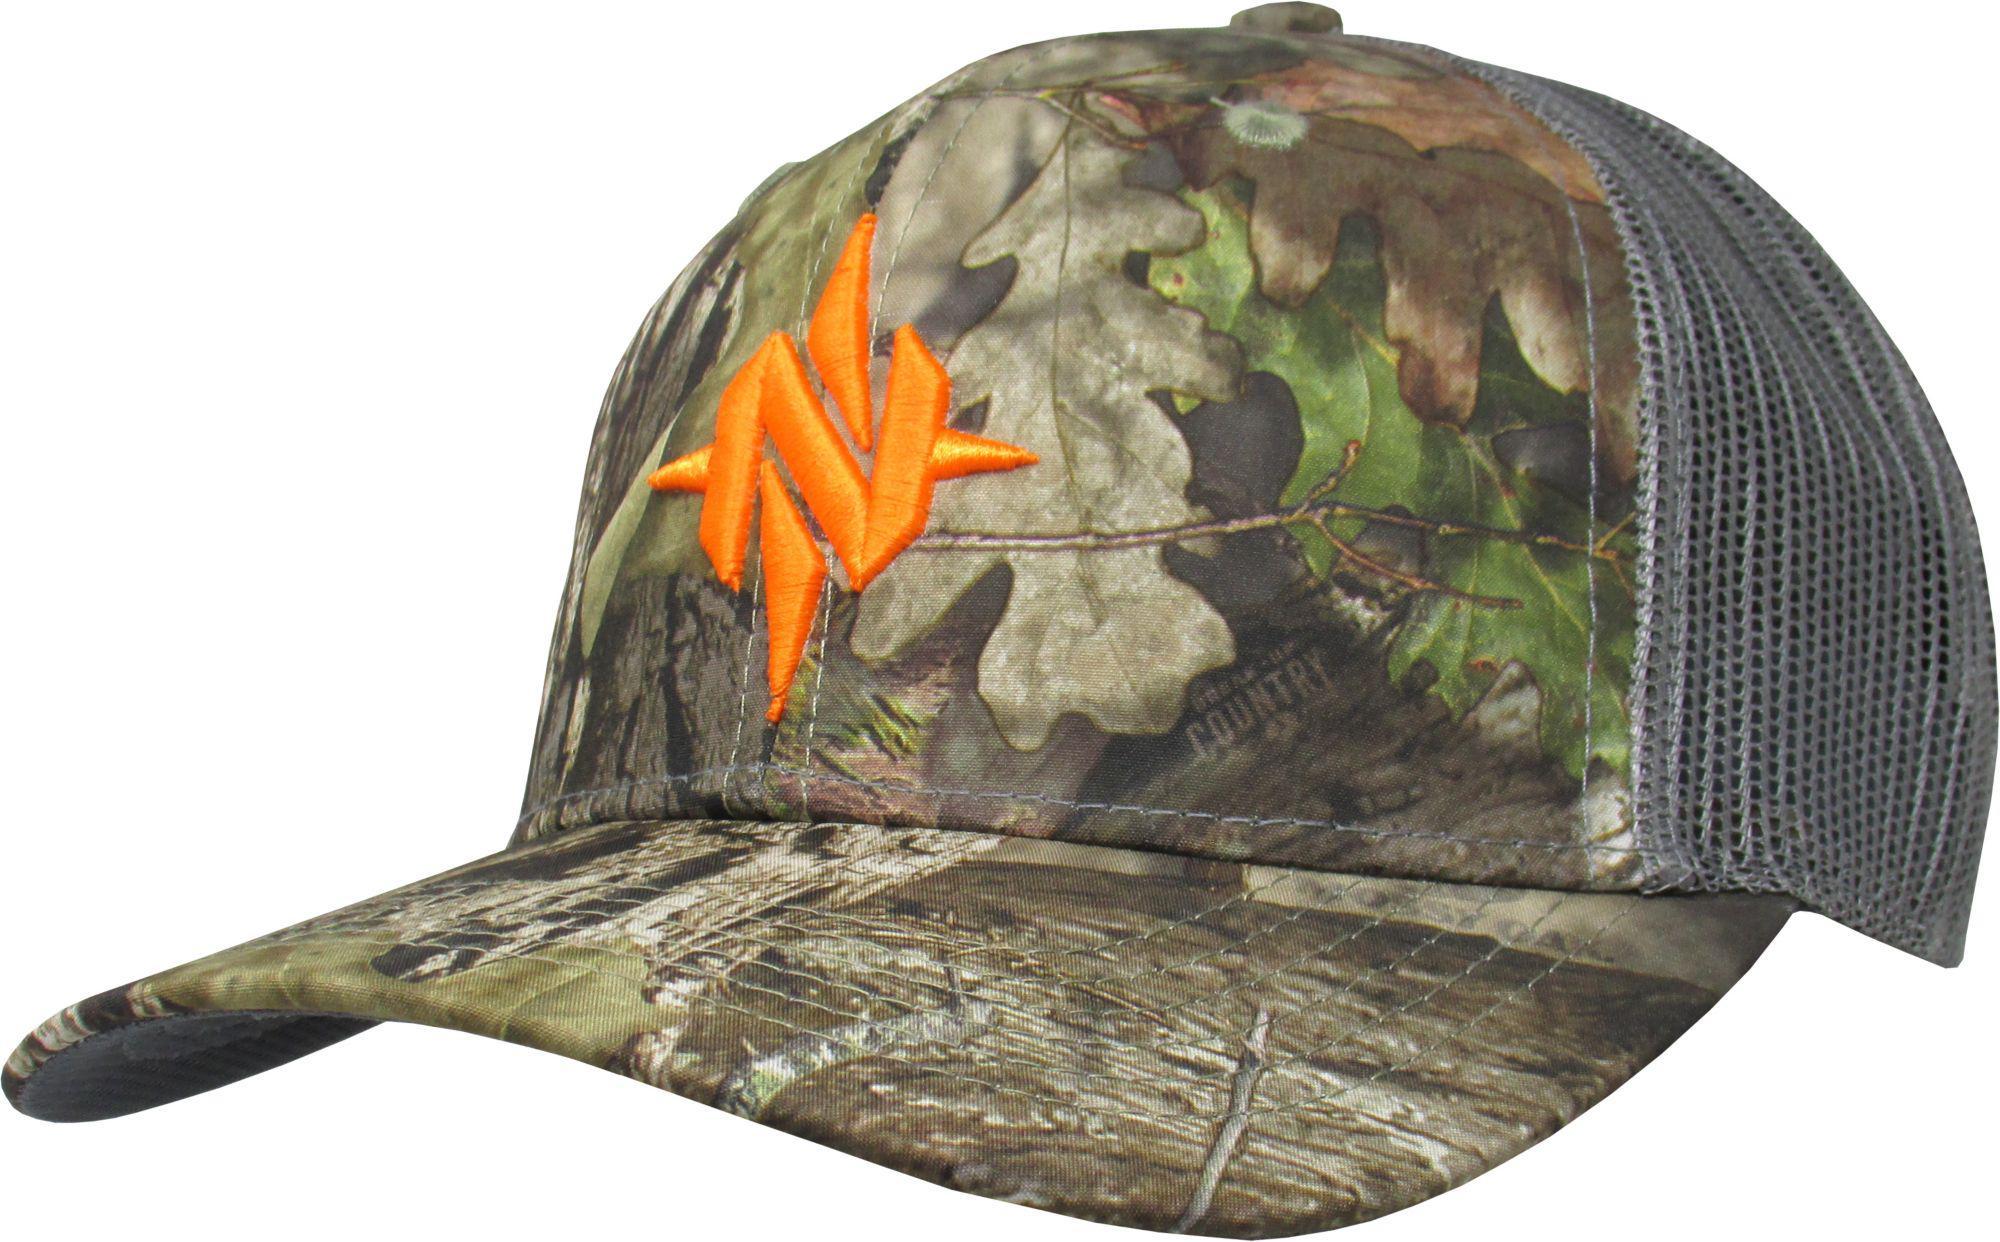 2c723e7d38c6 Nomad Multicolor Camo Trucker Hat for men. View fullscreen